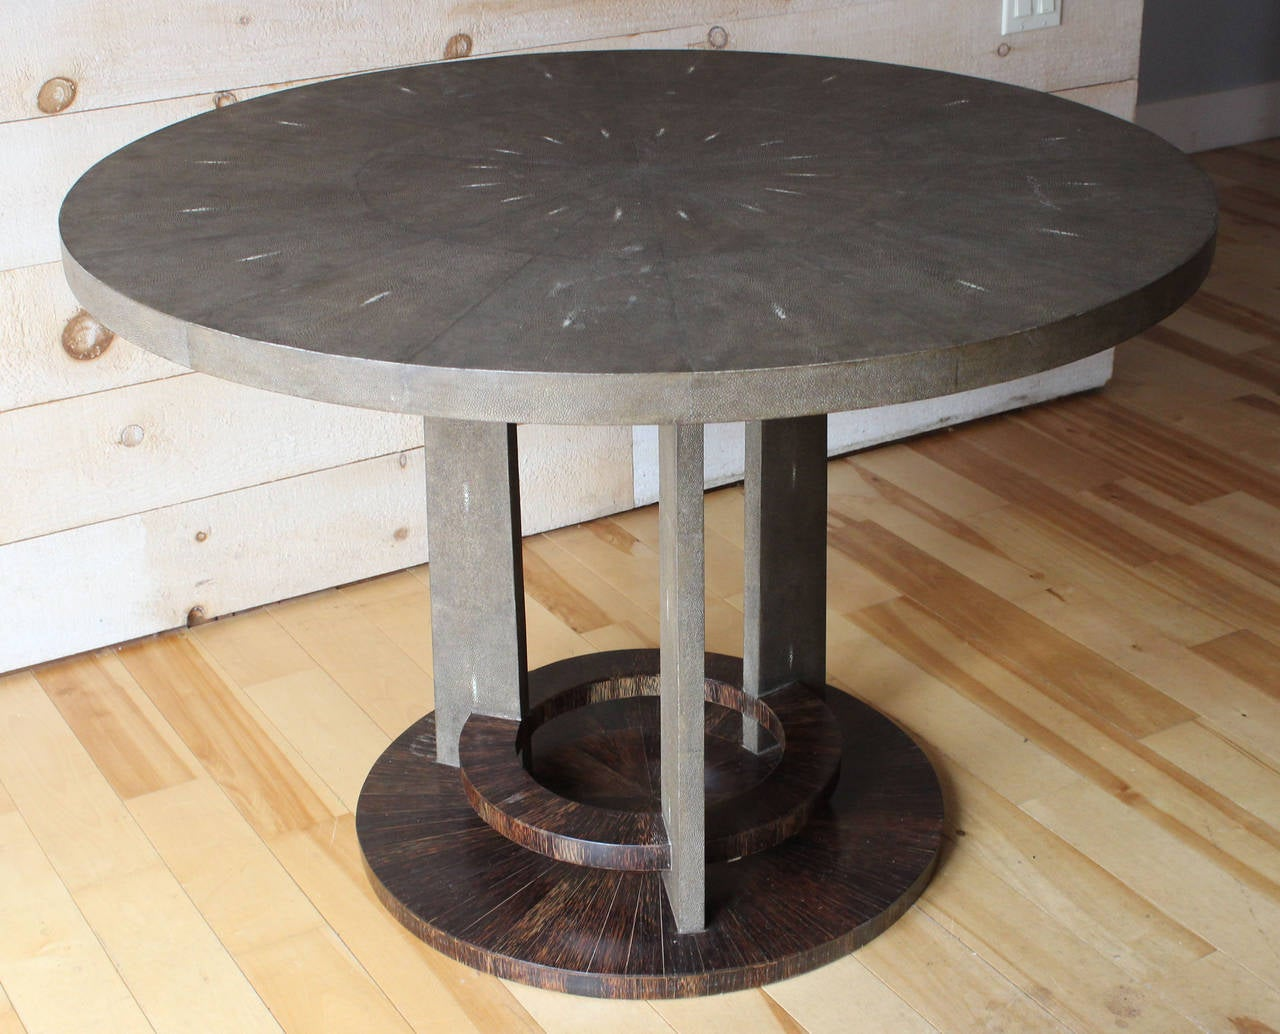 R U0026 Y Augousti Shagreen Table And Stools 2